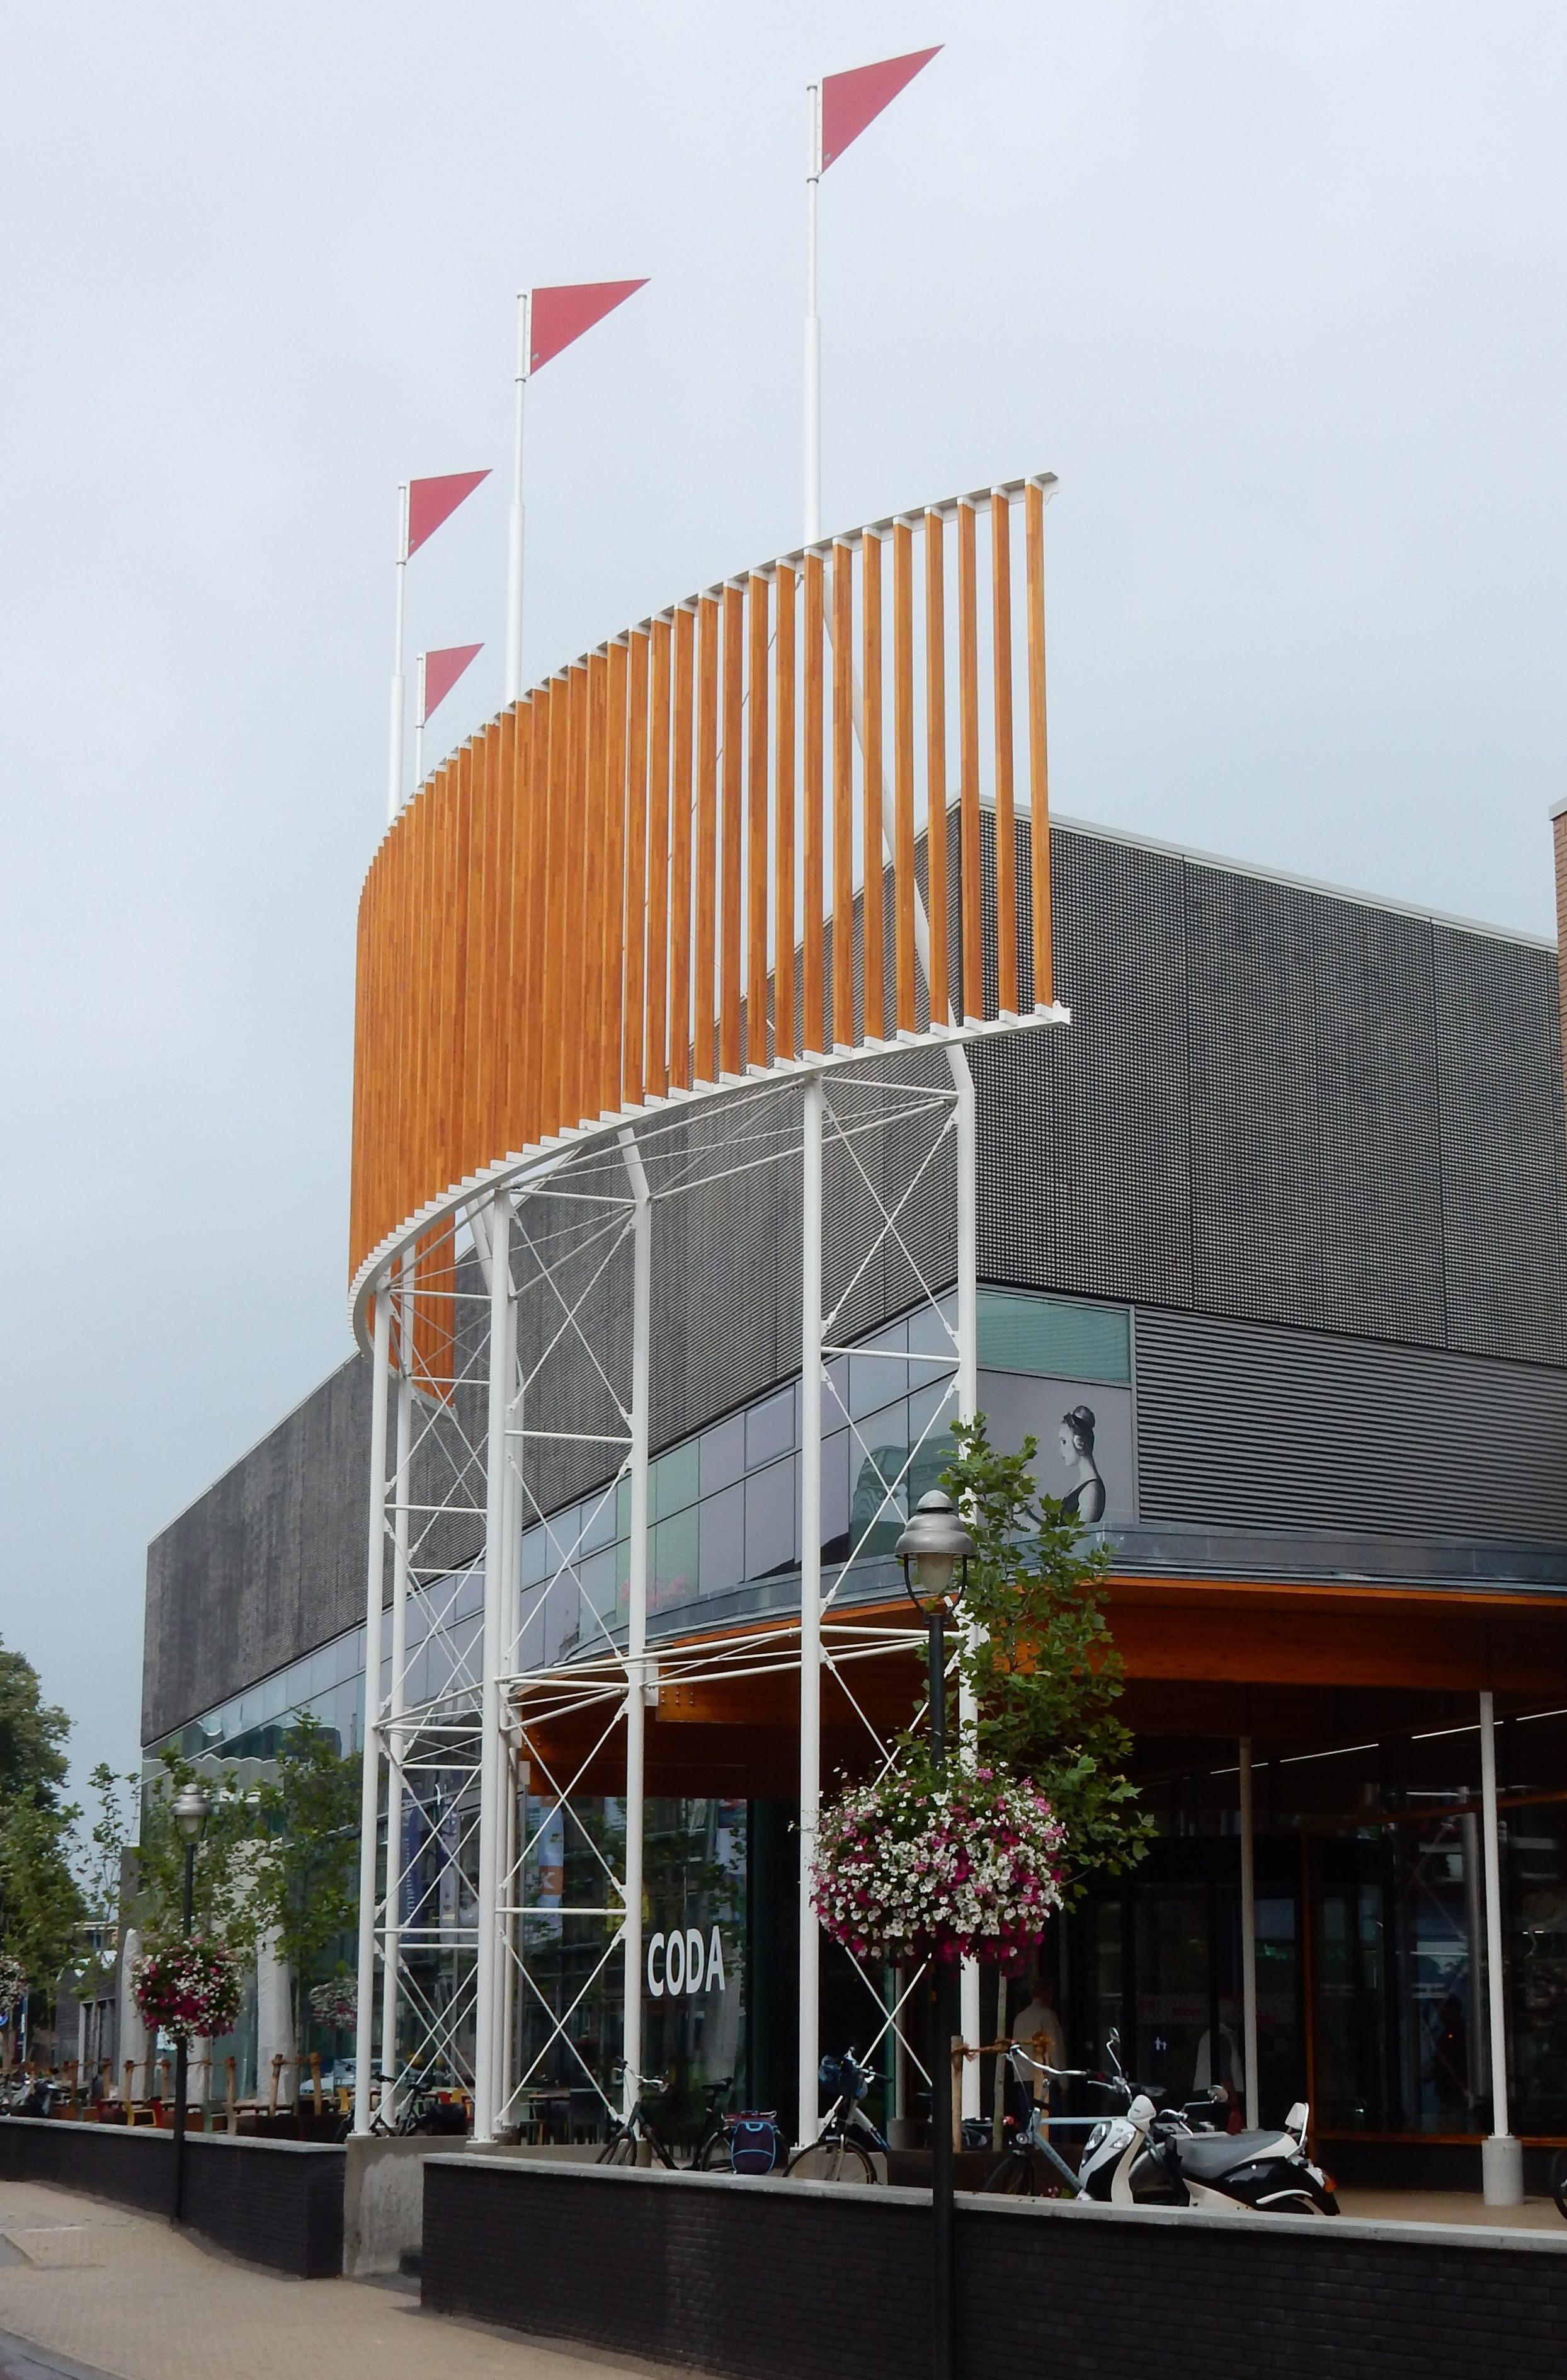 Vernieuwde entree CODA, 2019. Foto Esther Doornbusch 2019, CC BY 4.0